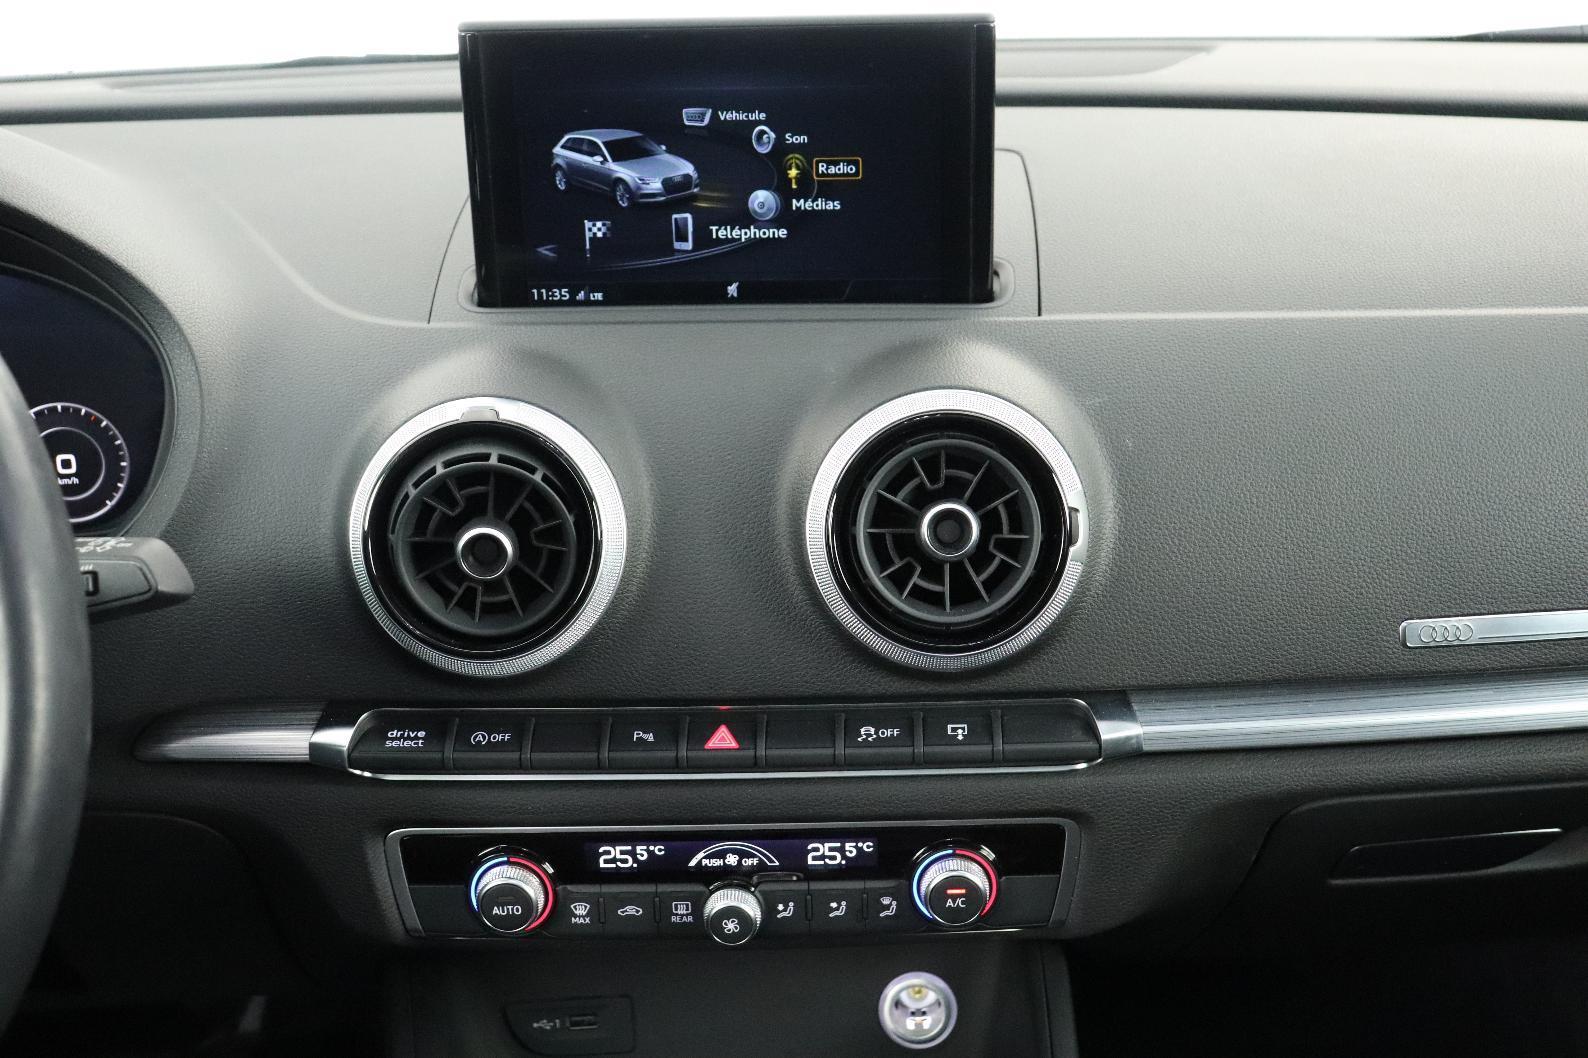 AUDI A3 SPORTBACK A3 Sportback 2.0 TDI 150 S tronic 6 Design Luxe